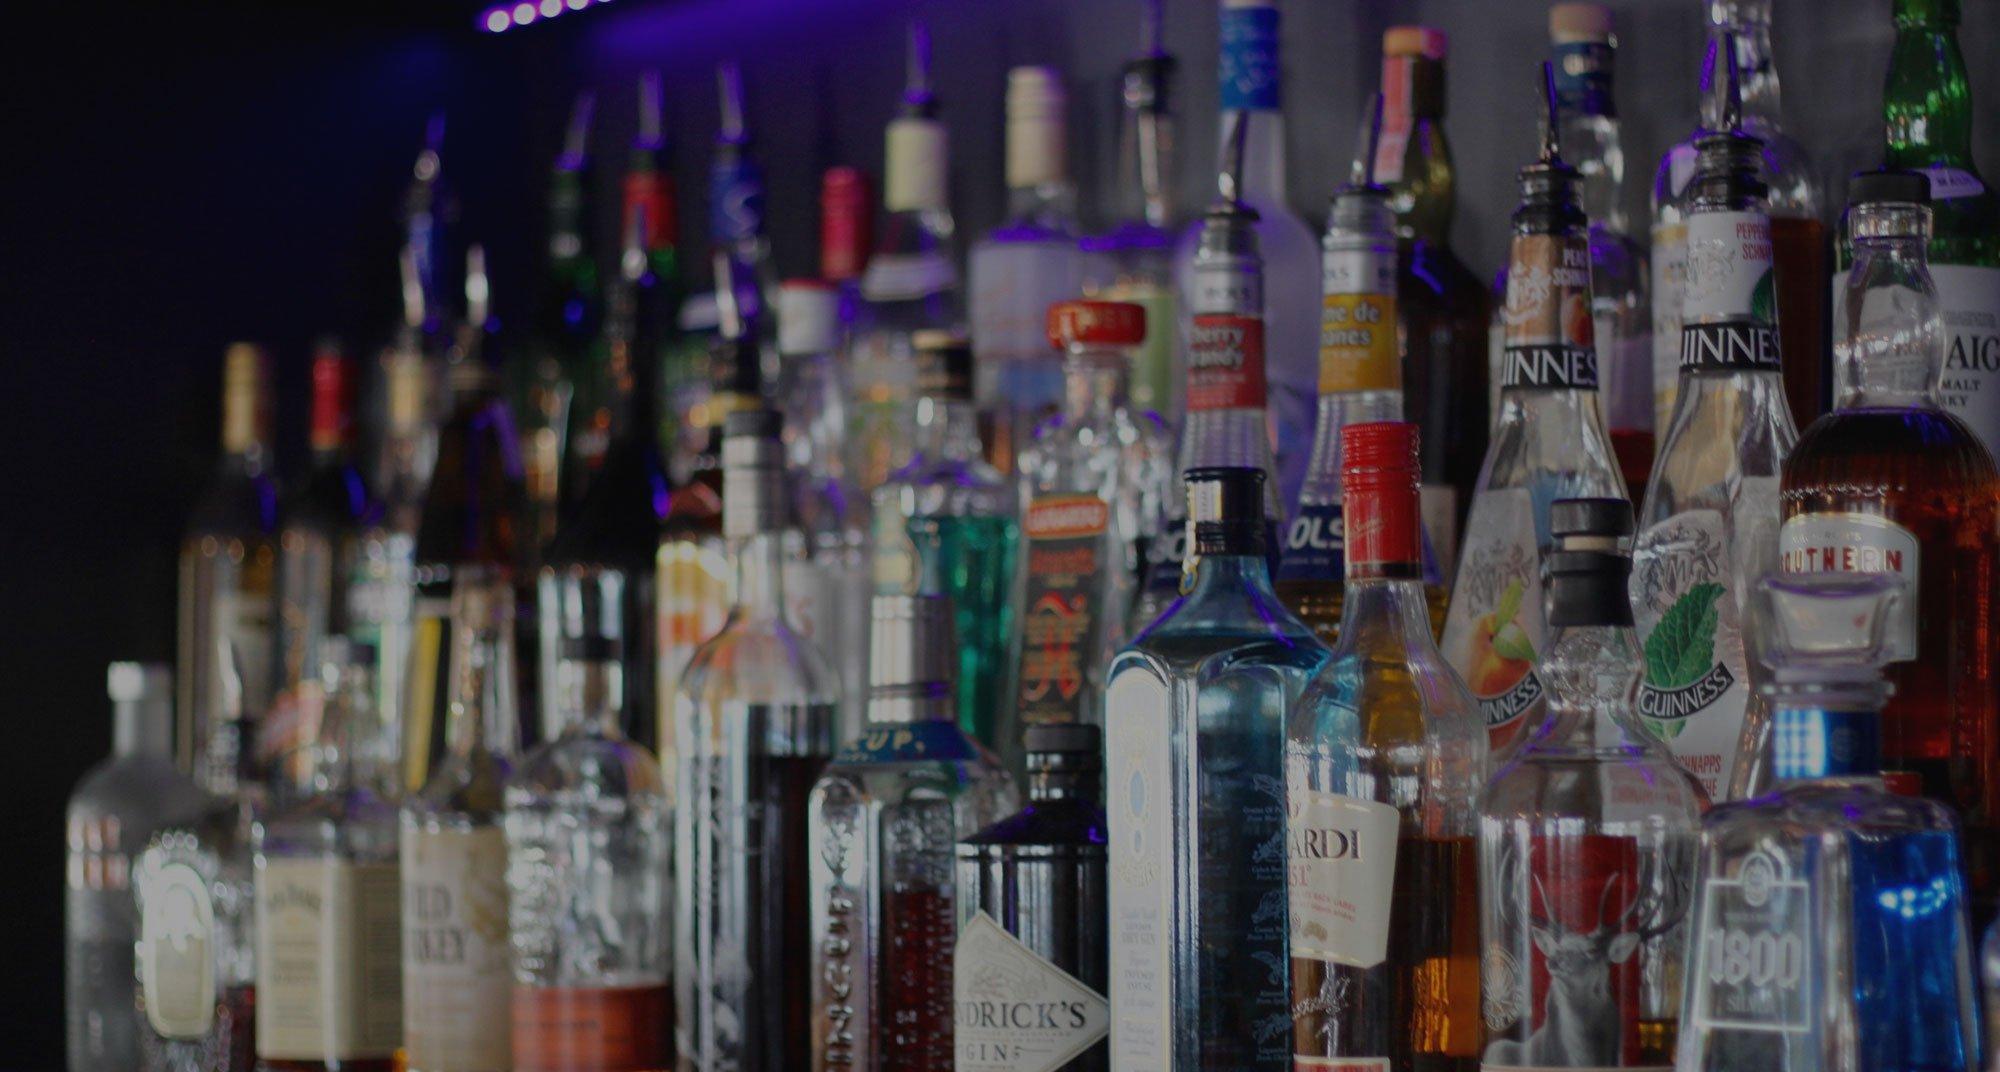 Liquor selection at the bar